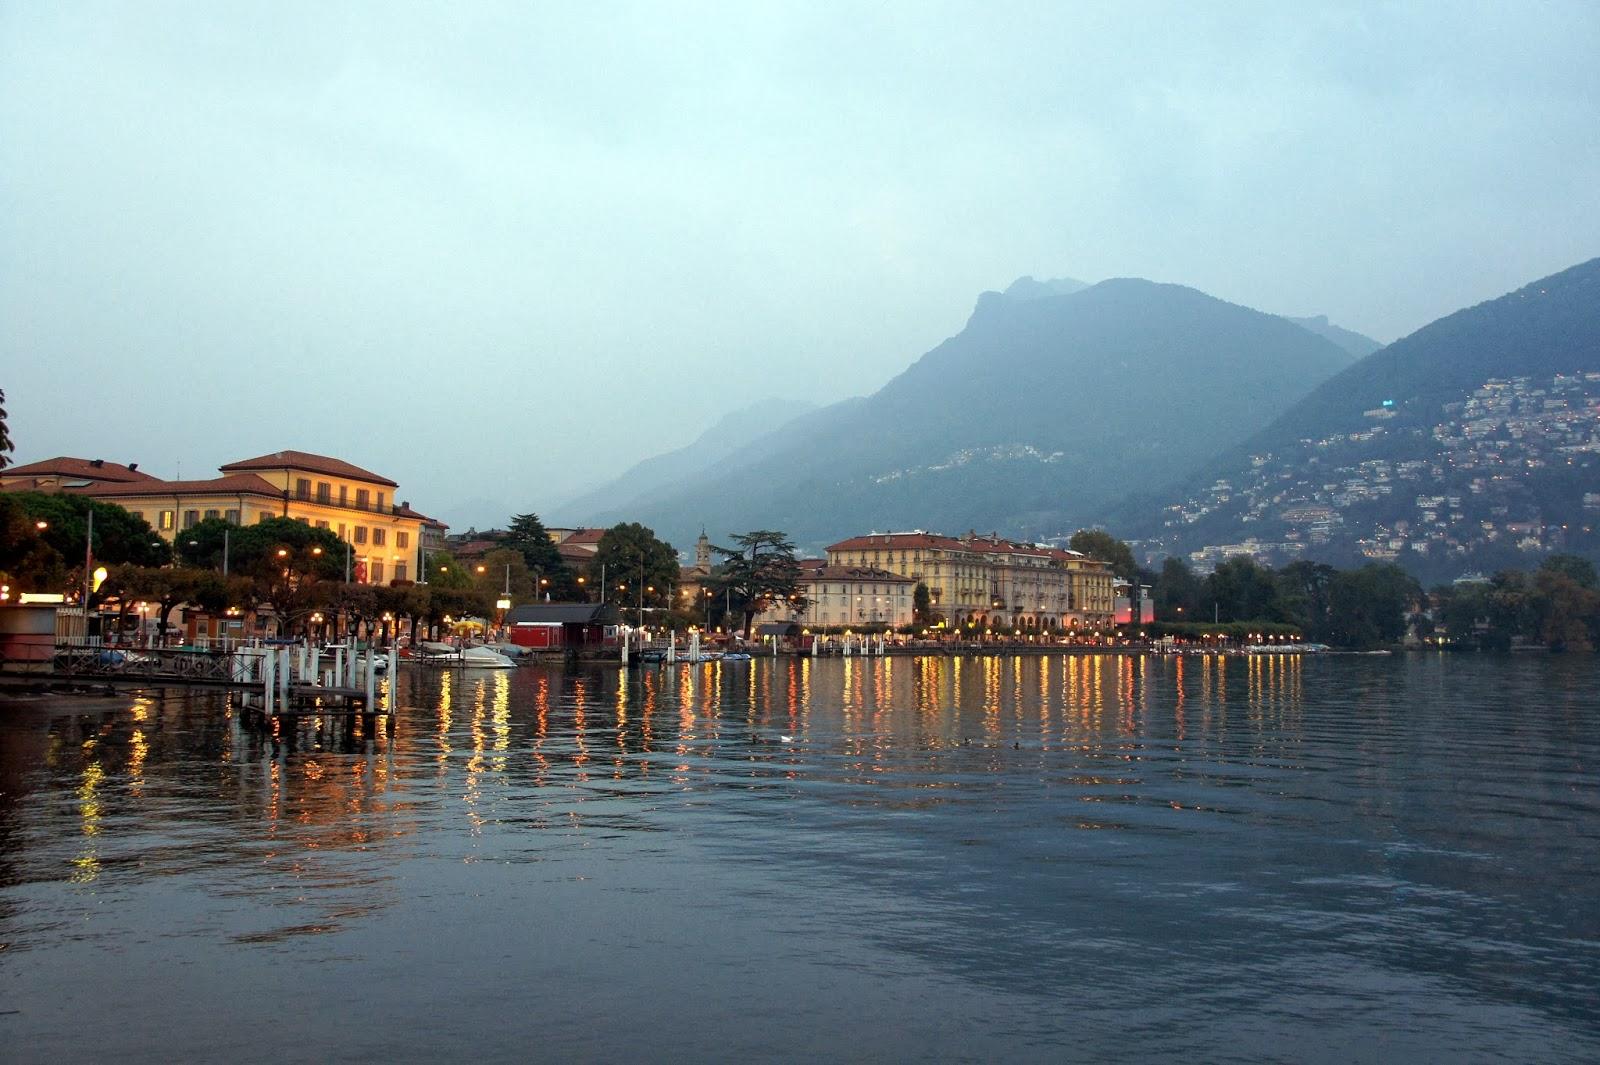 11 Stories: 2011/09/24 瑞士景觀火車之旅10日 聖莫里茲—棕櫚特快車—高山湖區—盧加洛Lugano